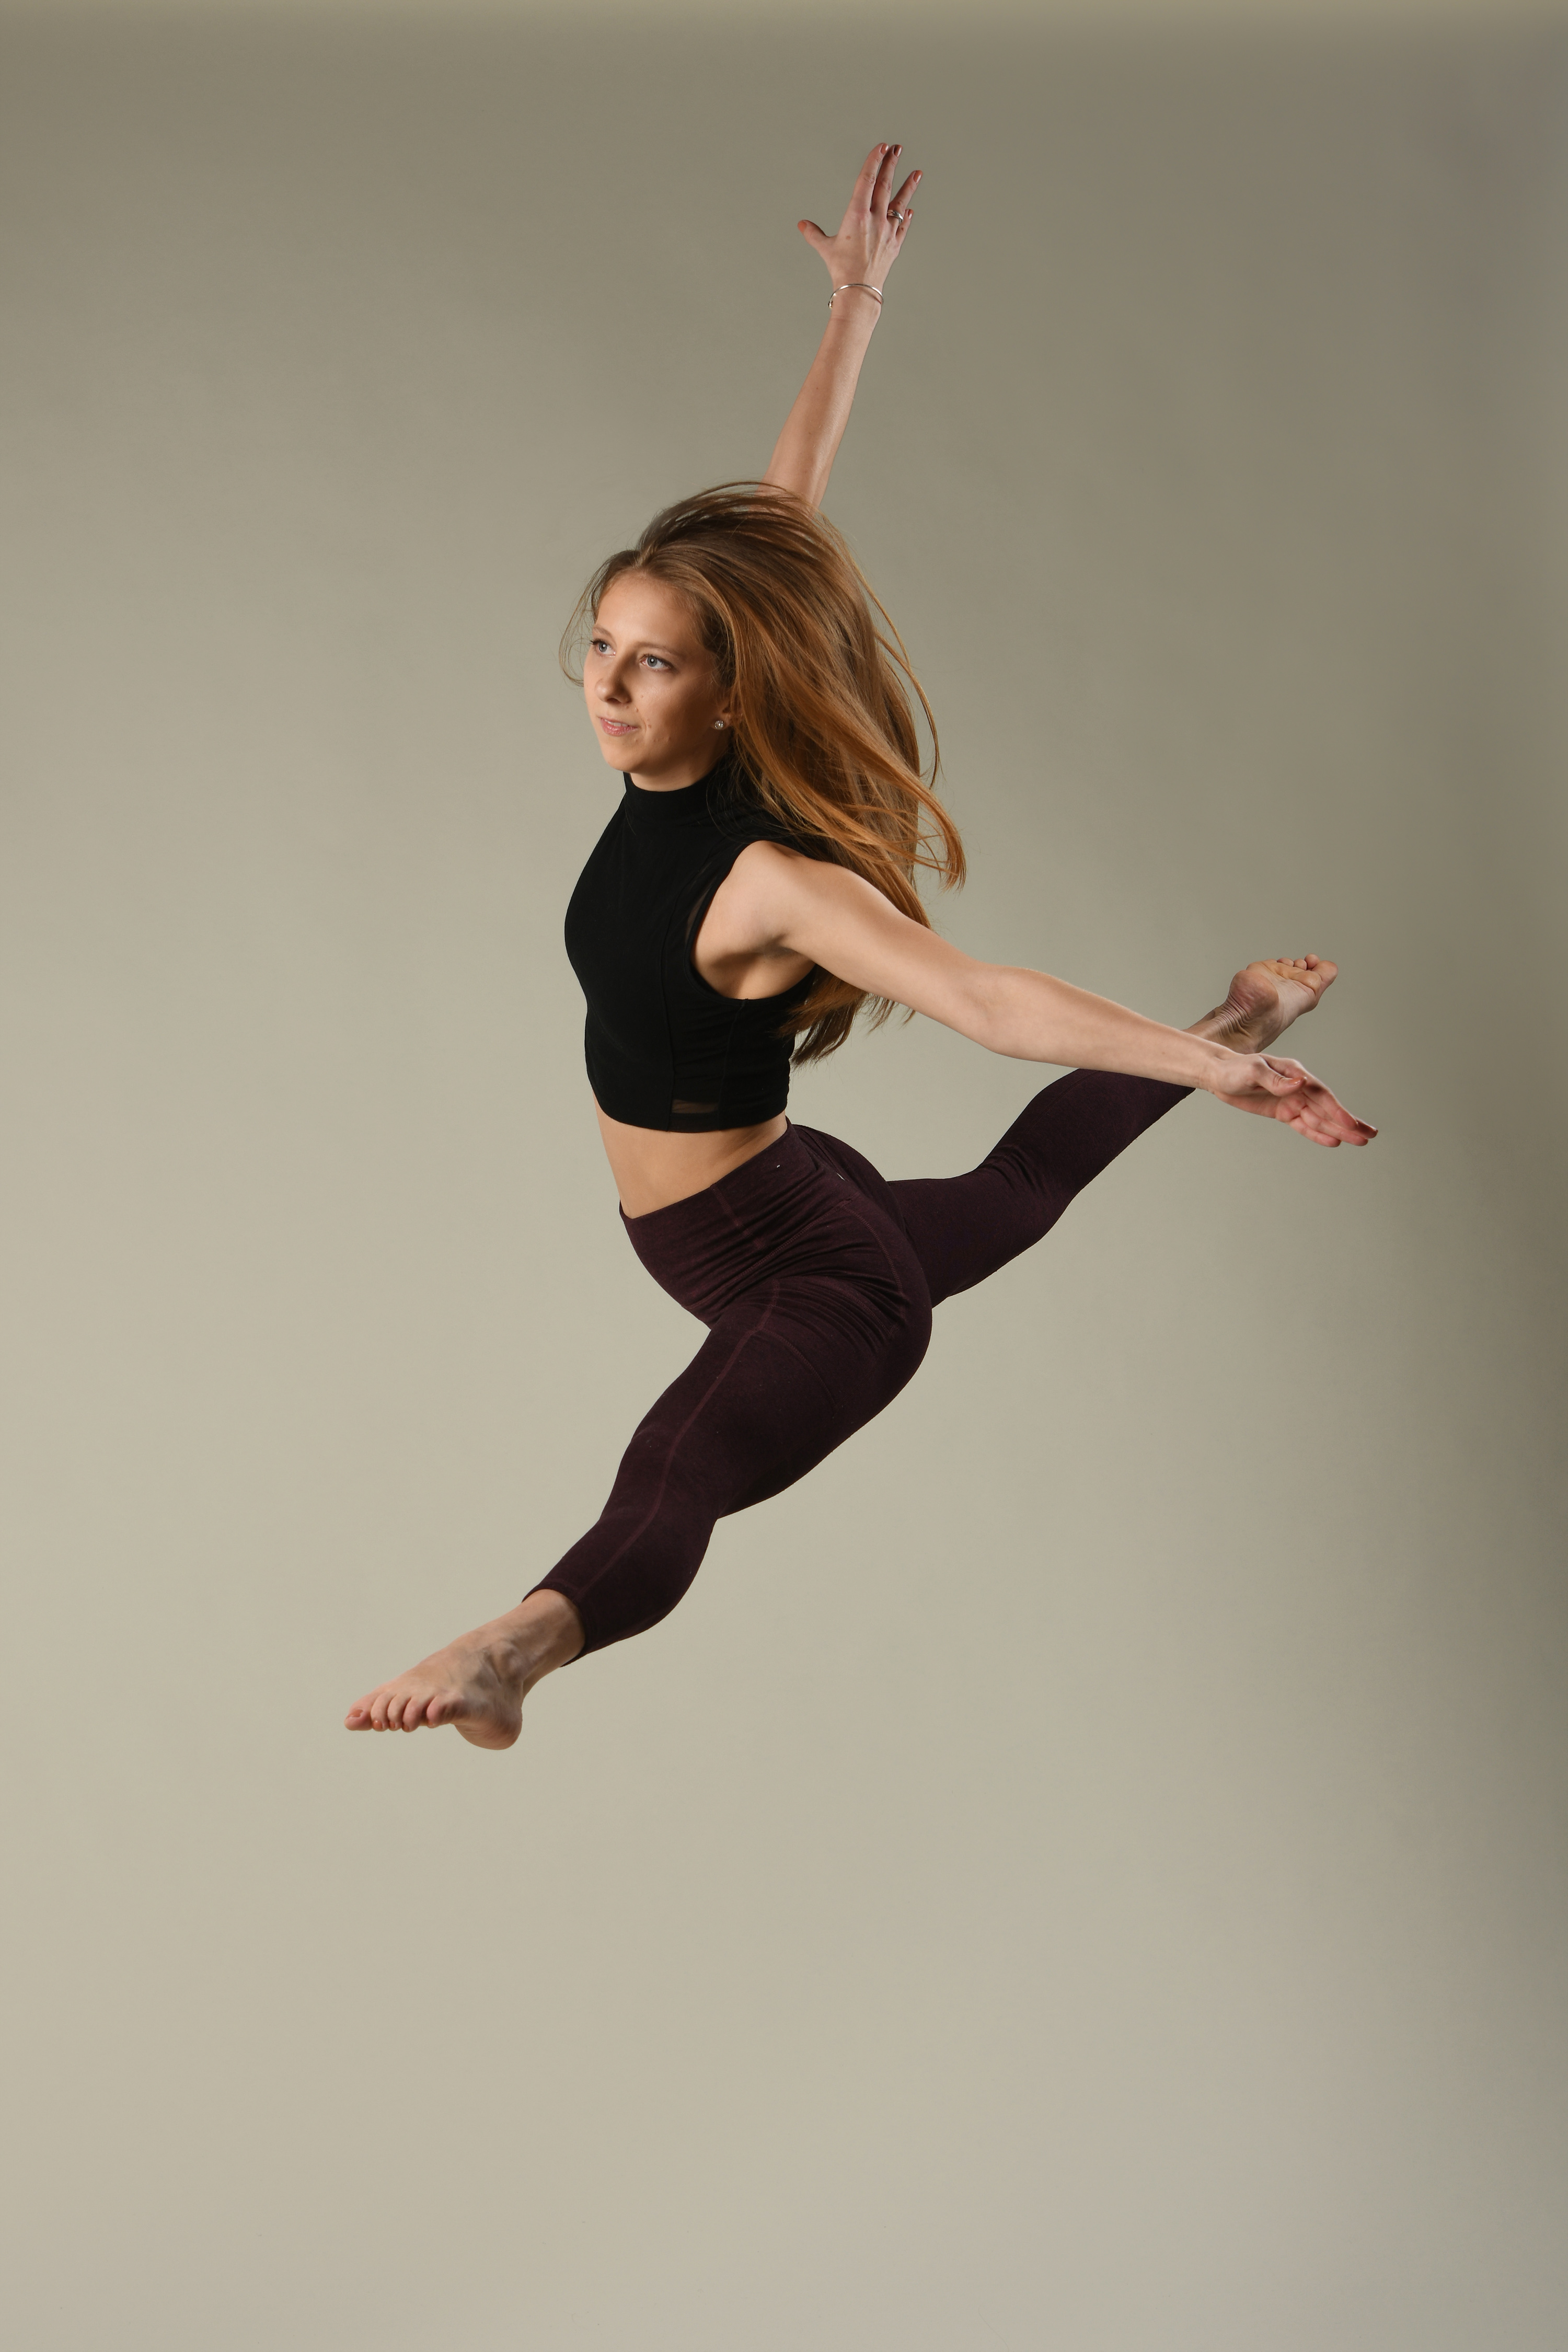 Erin Lyons jump